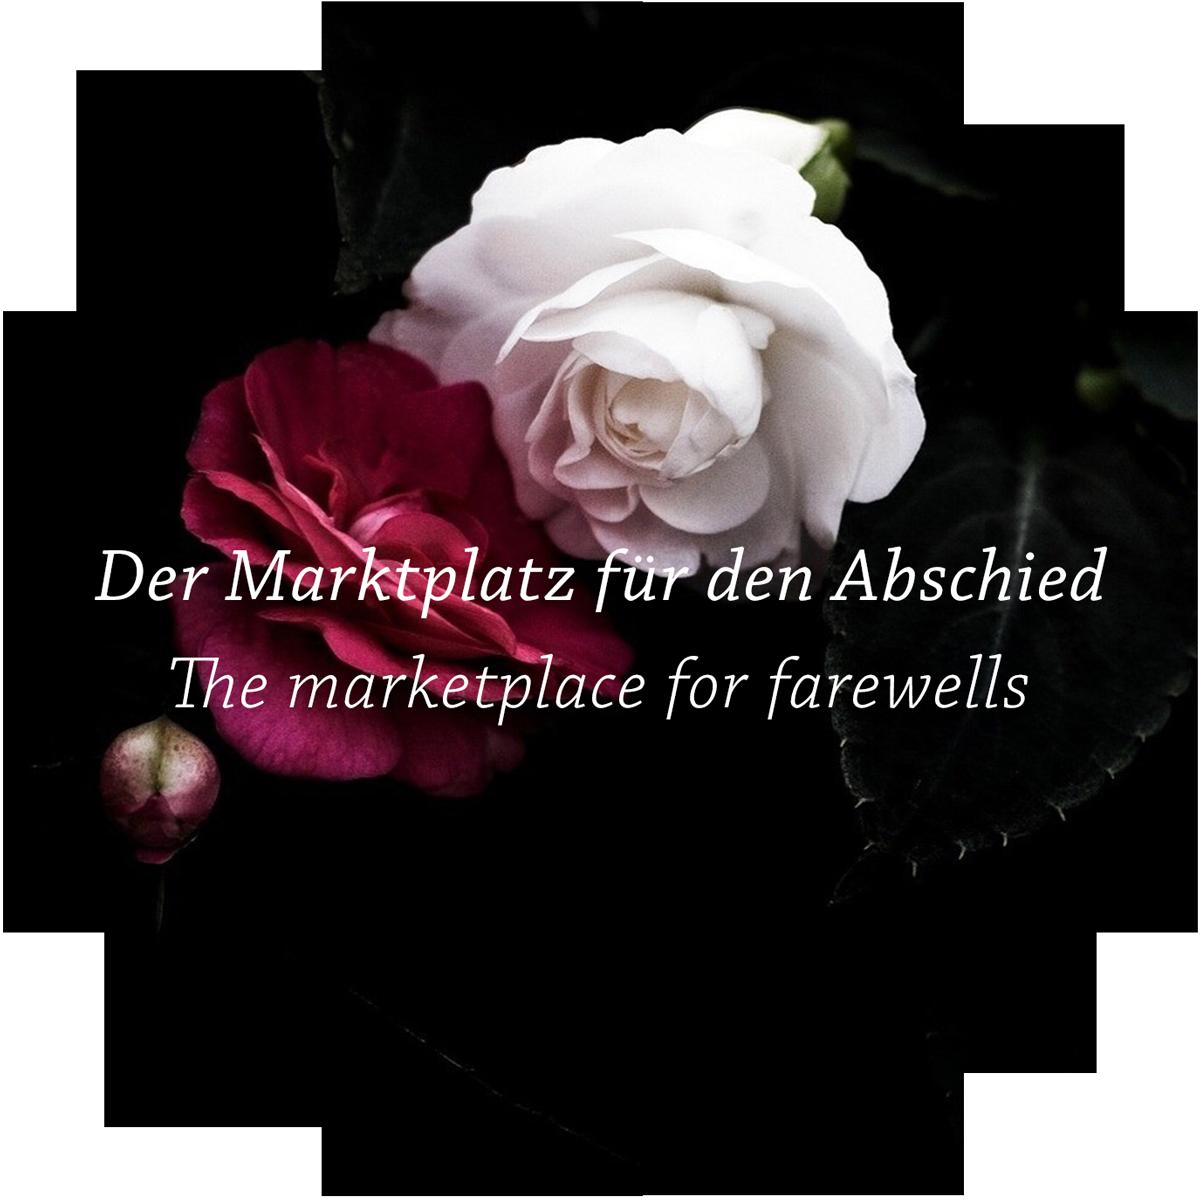 convela_funeralmarketplace_bestattung_web02.png